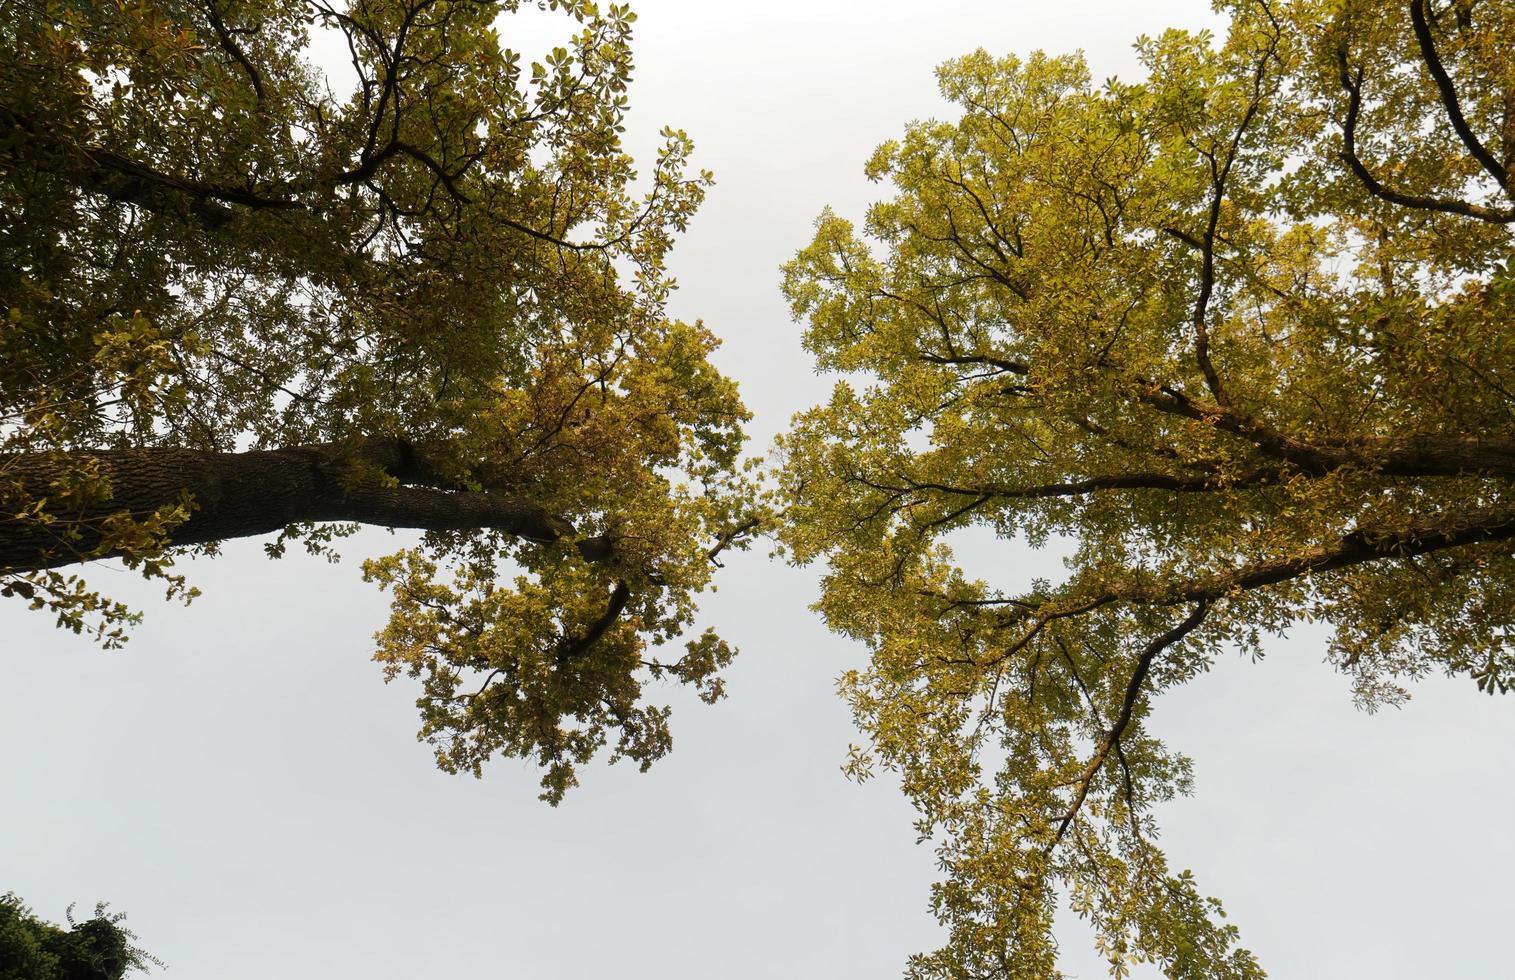 Tree foliage in autumn season photo